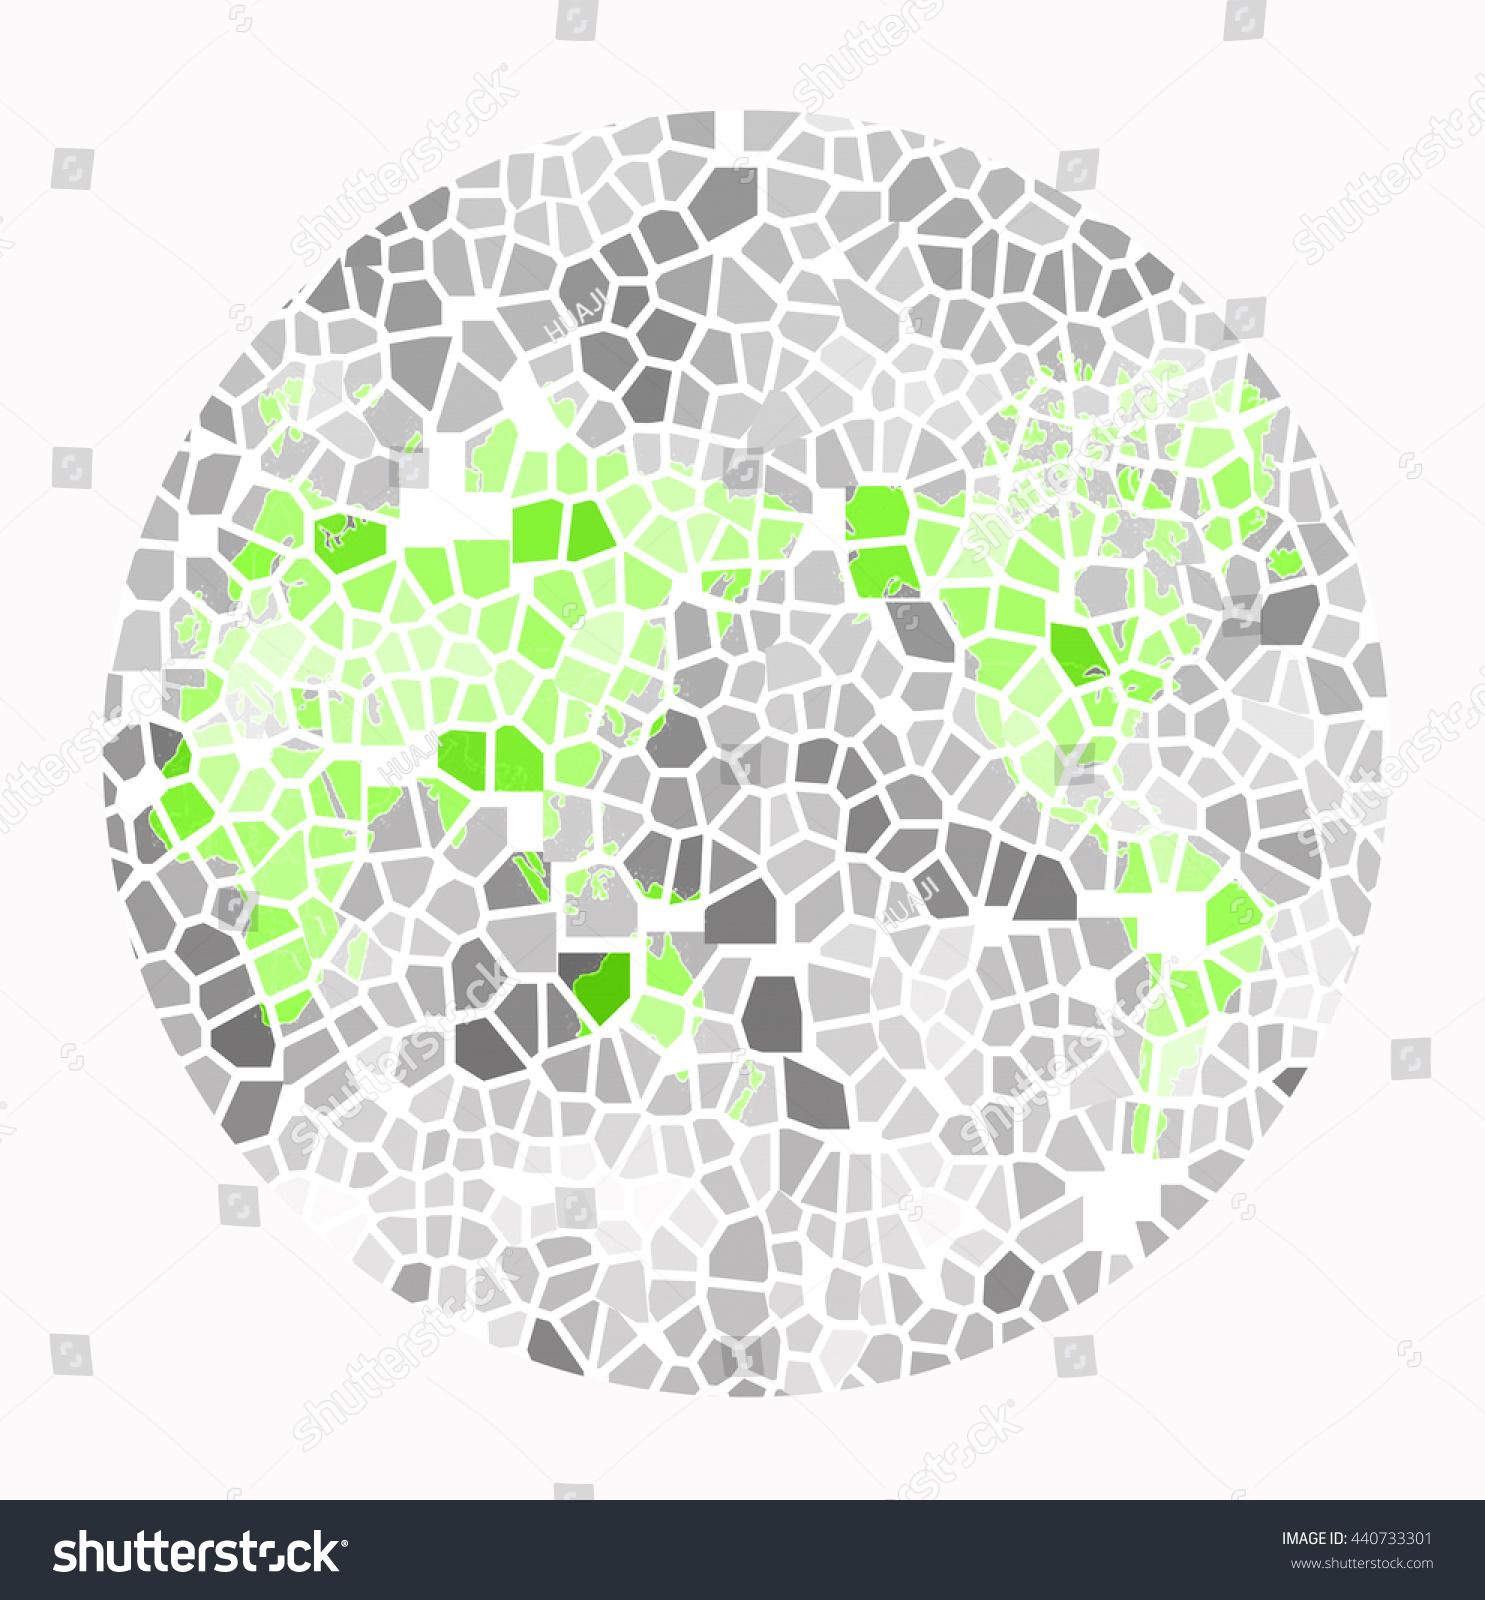 Color Blind Test The World Map Stock Illustration 440733301 ...